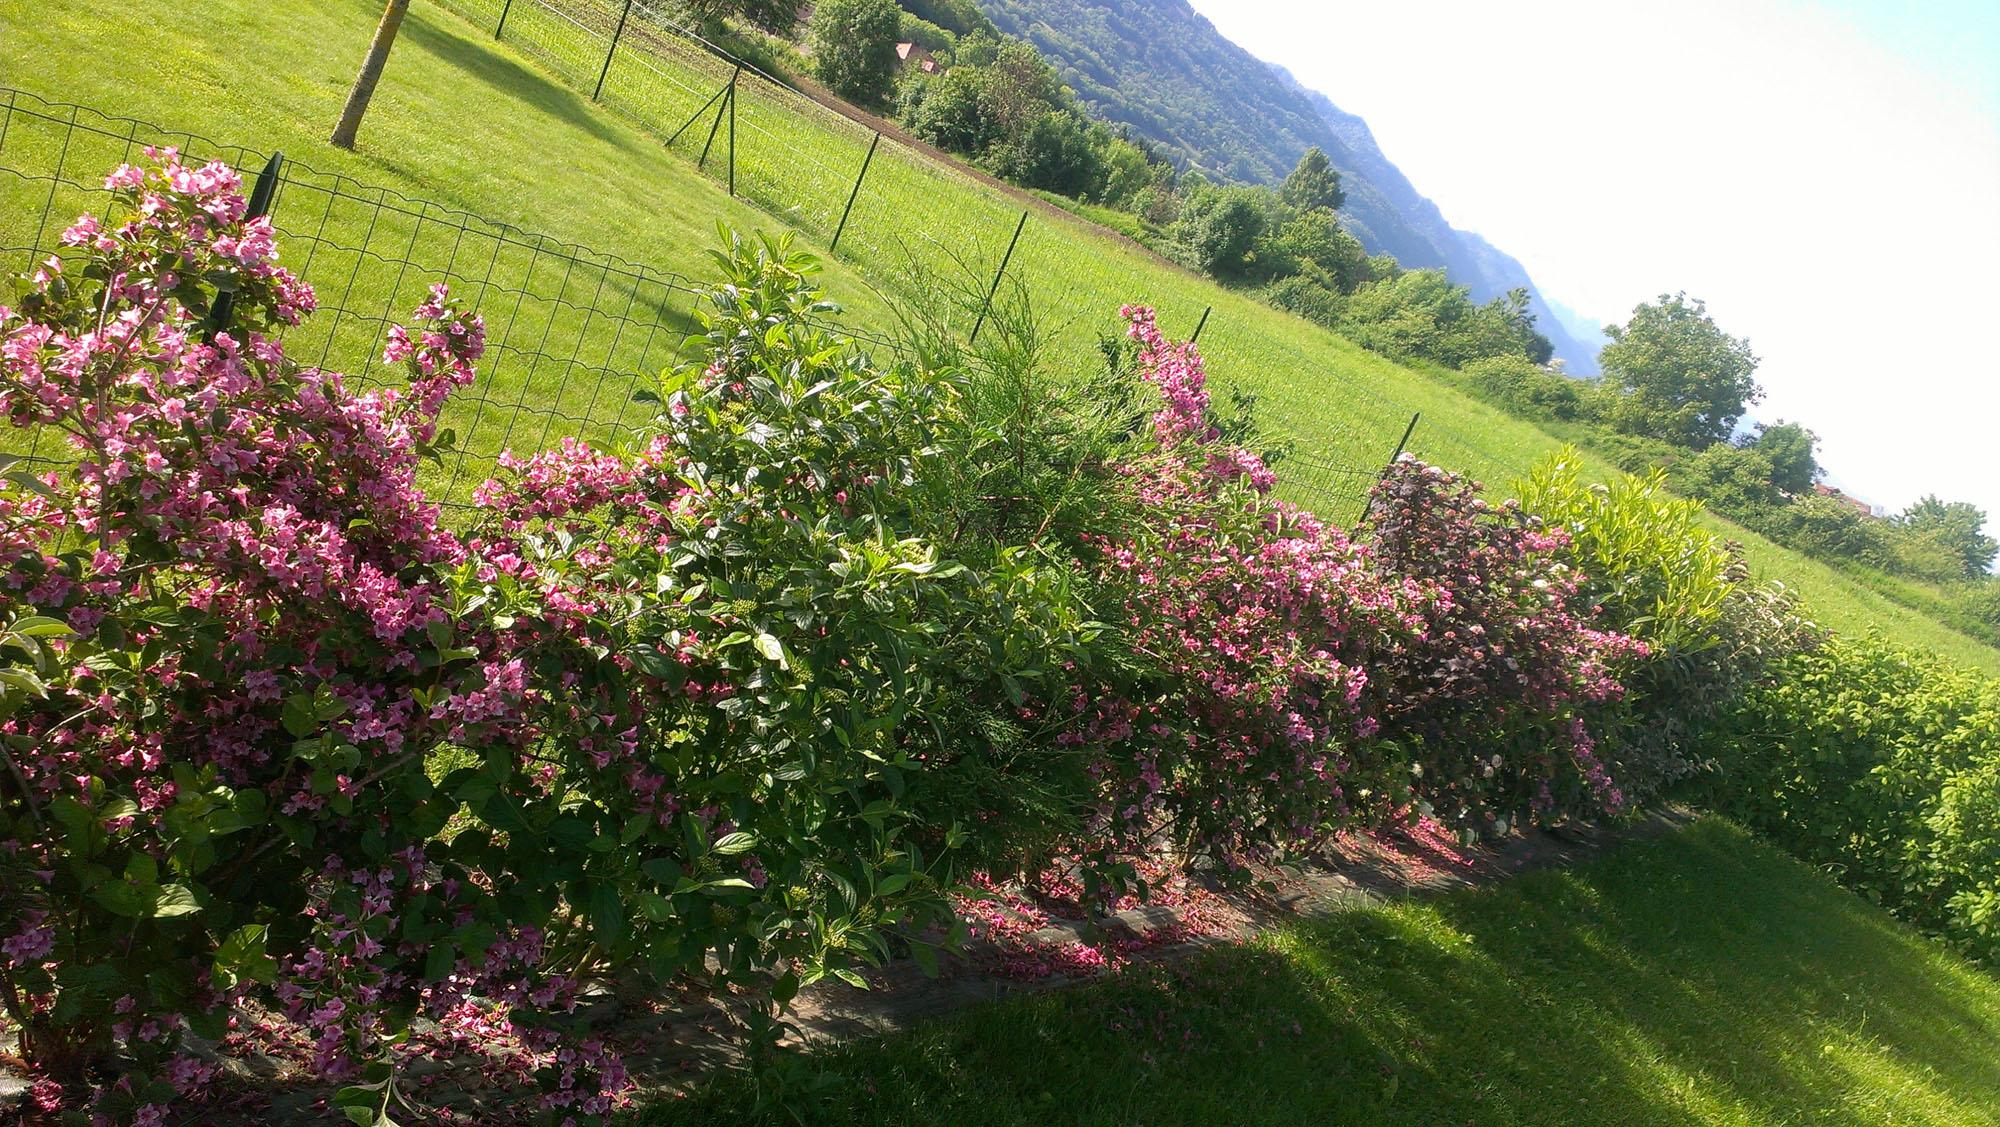 Cr ation et entretien d espace vert l 39 artisan des jardins for Entretien jardin 76